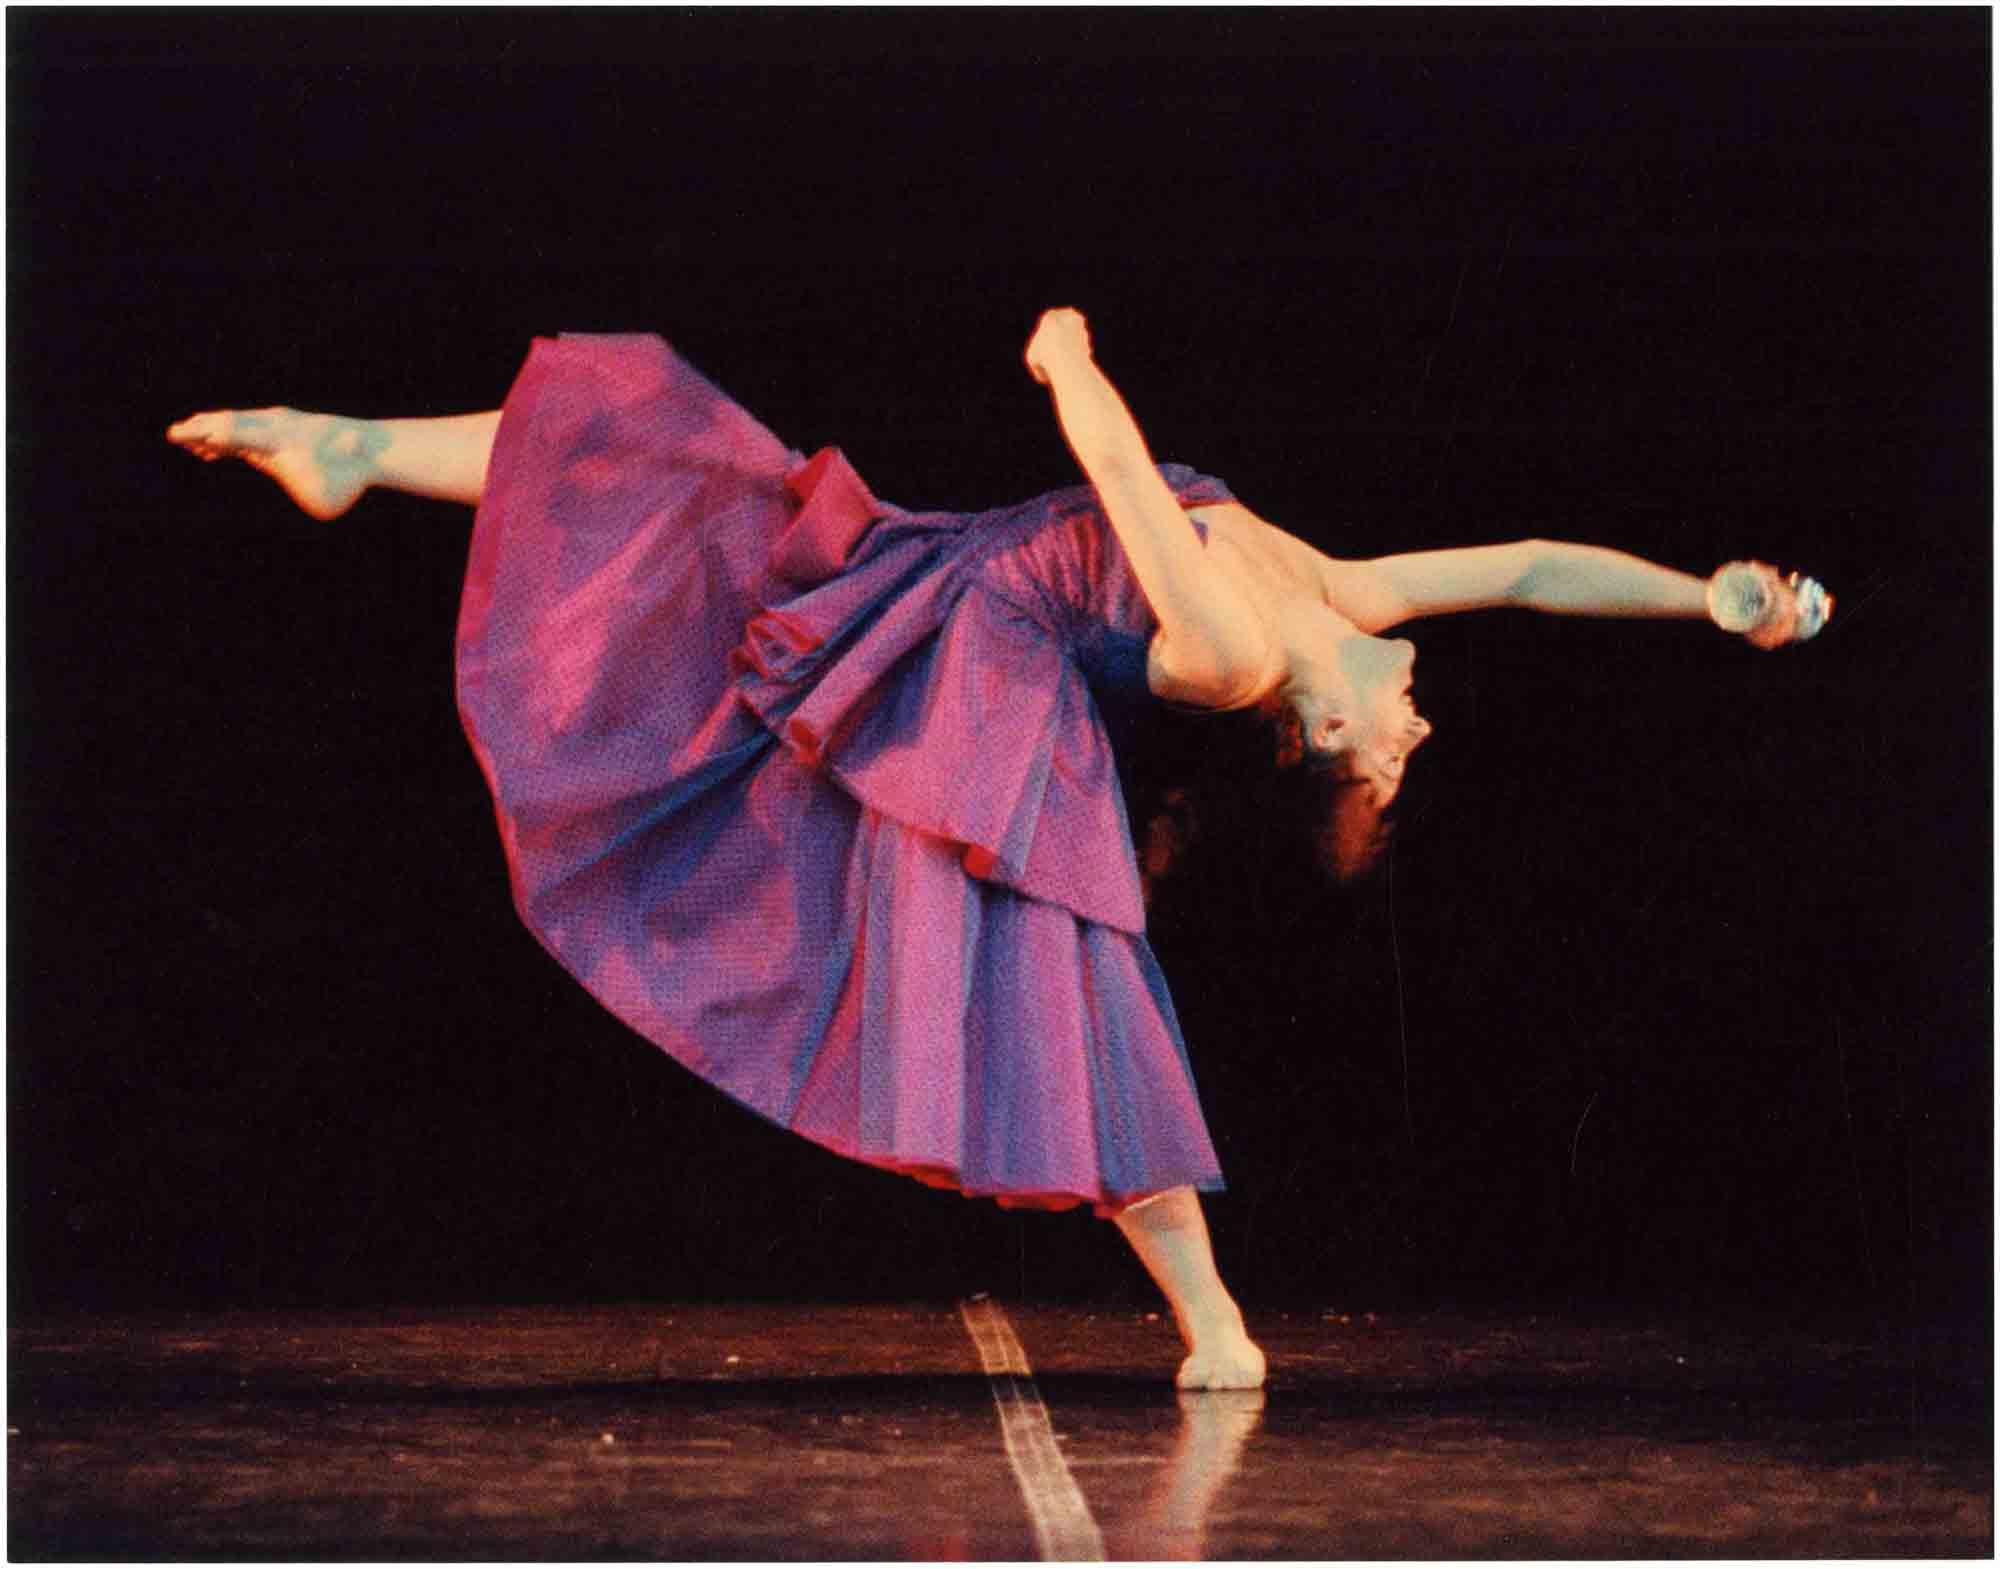 A la larga algo queda - A caballo regalado más vale pájaro en mano, Companyia Mar Gómez. Teatre Adrià Gual, 1993. Fotografia de Josep Aznar